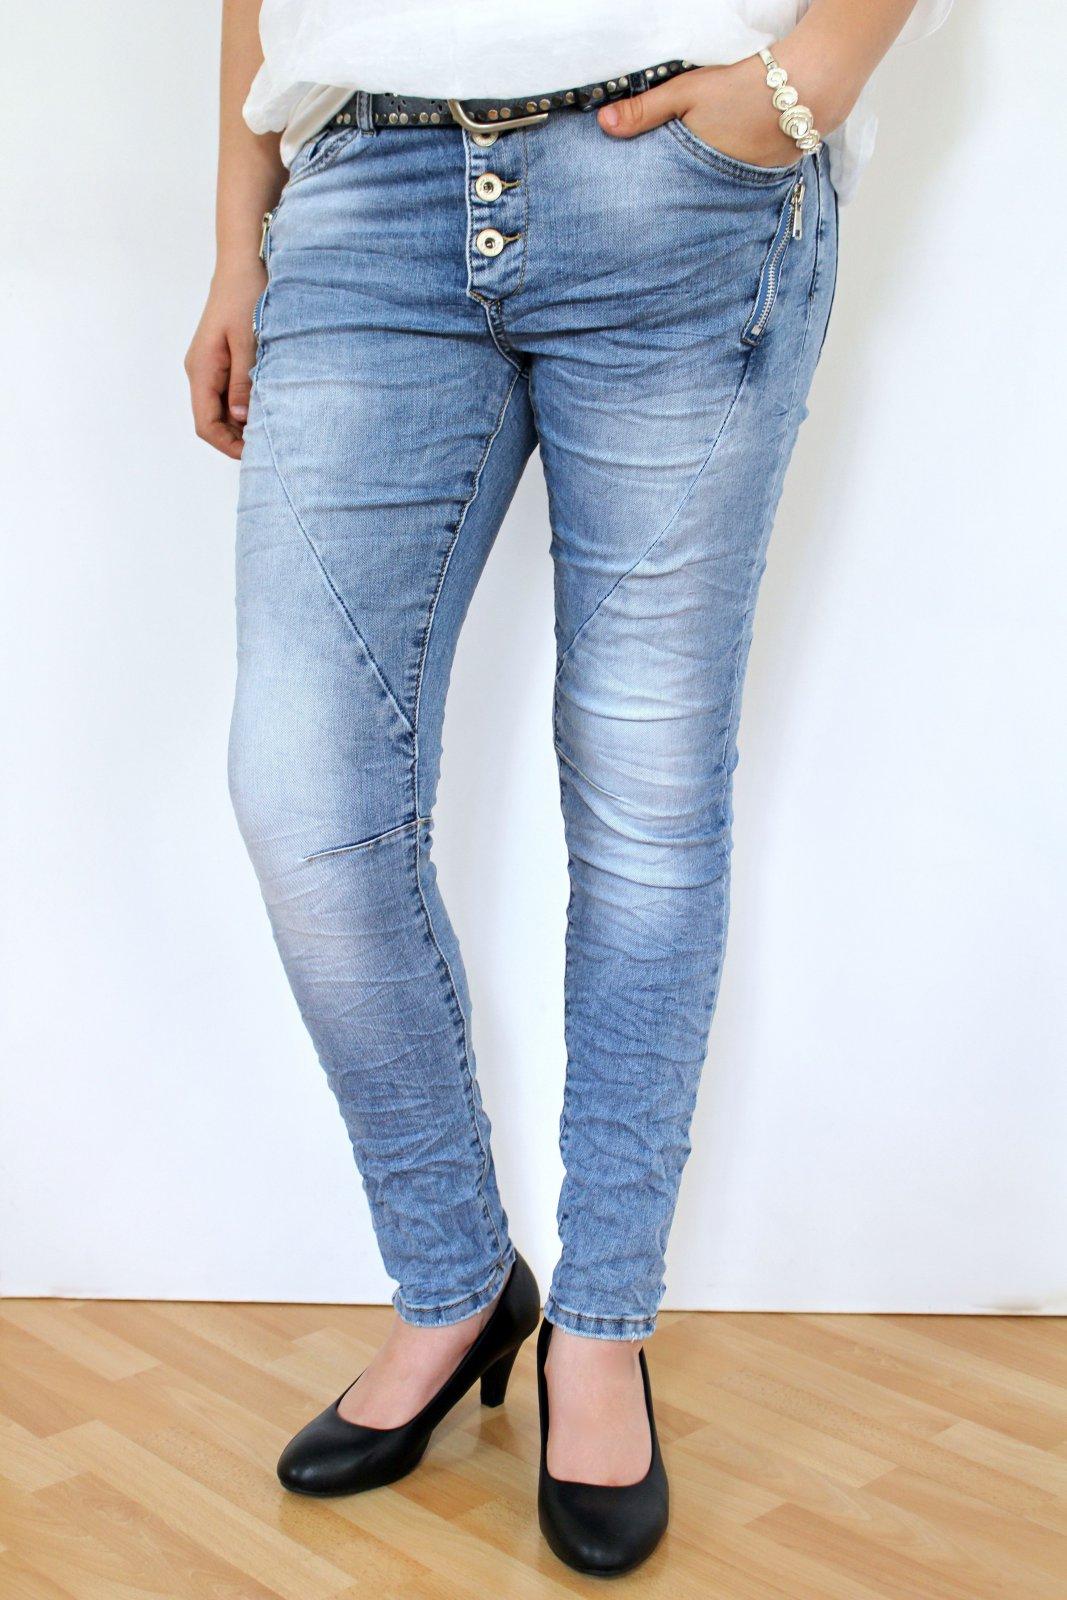 Mayaadi Damen Boyfriend Jewelly Jeans Hose Röhrenjeans Used